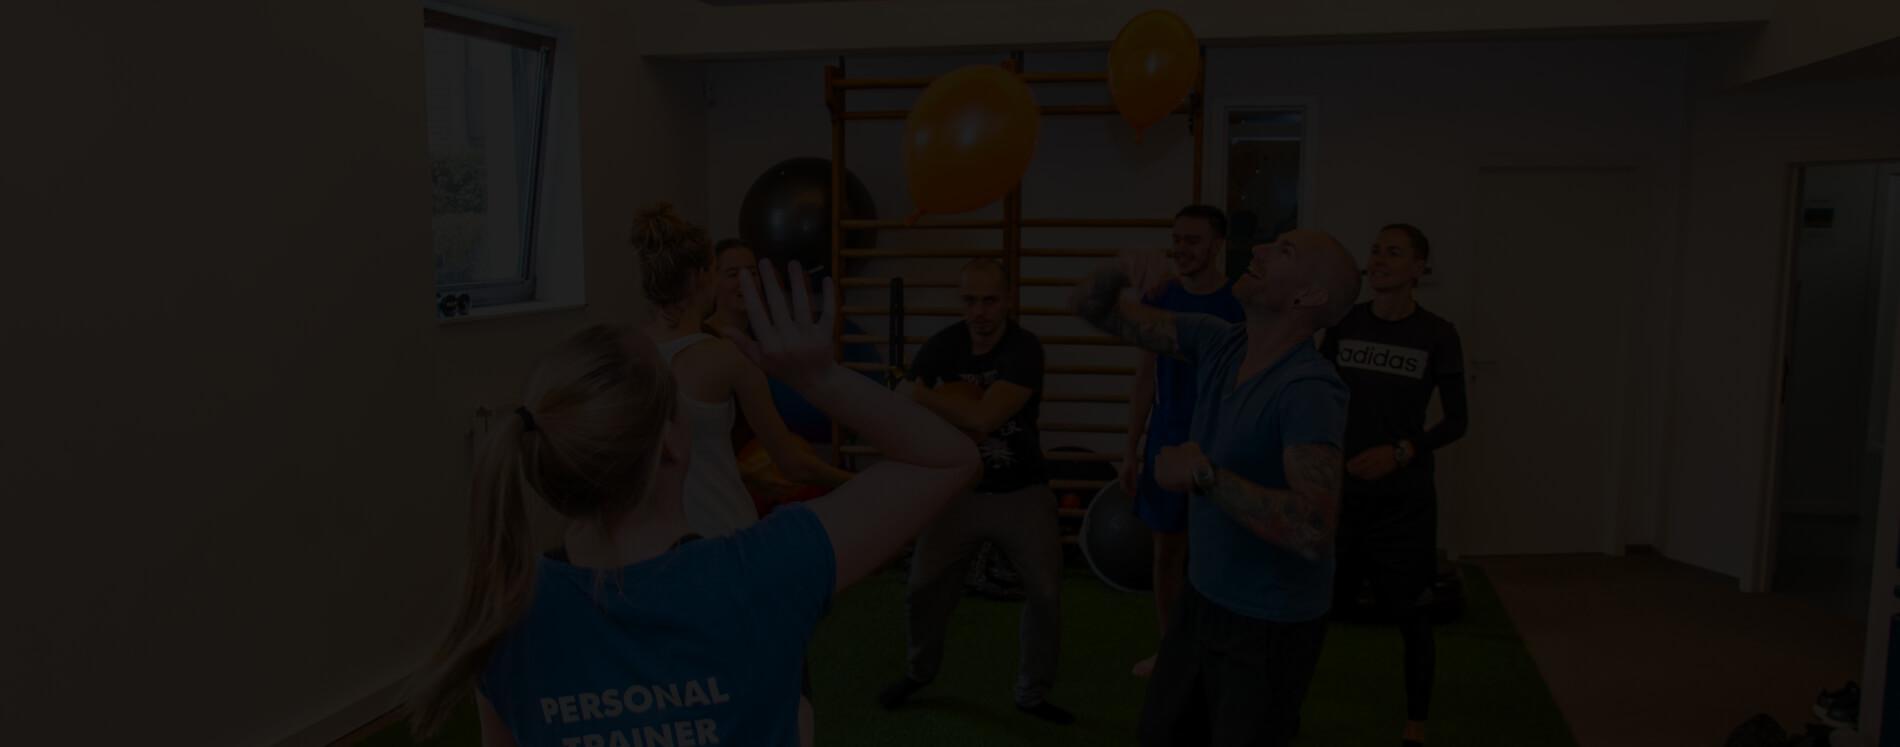 personal coach 4u sporten in deurne